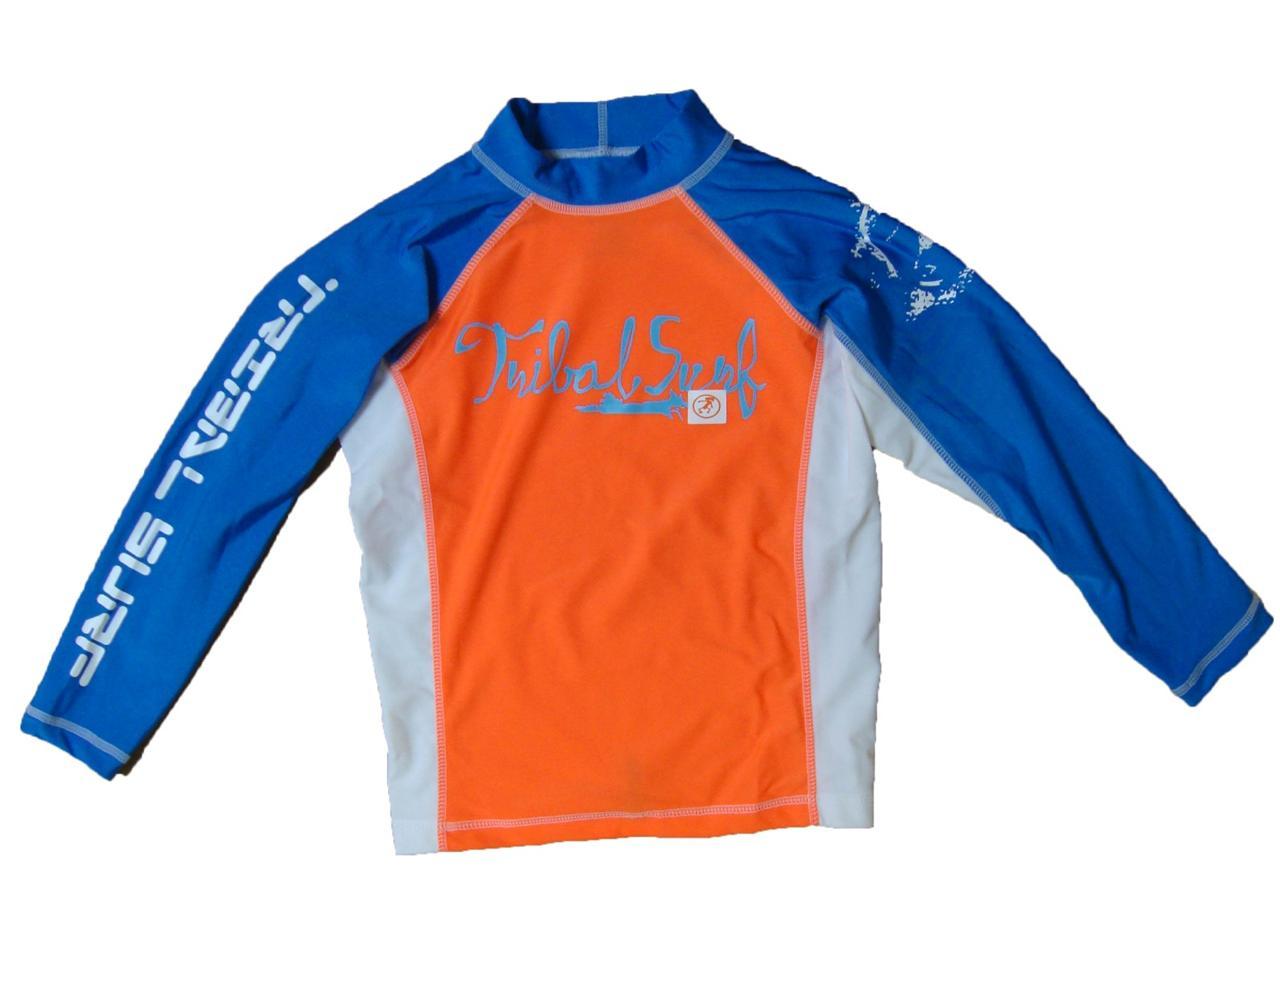 Unisex kids spf 50 surf shirt rash guard long sleeve kids Rash guard shirts kids